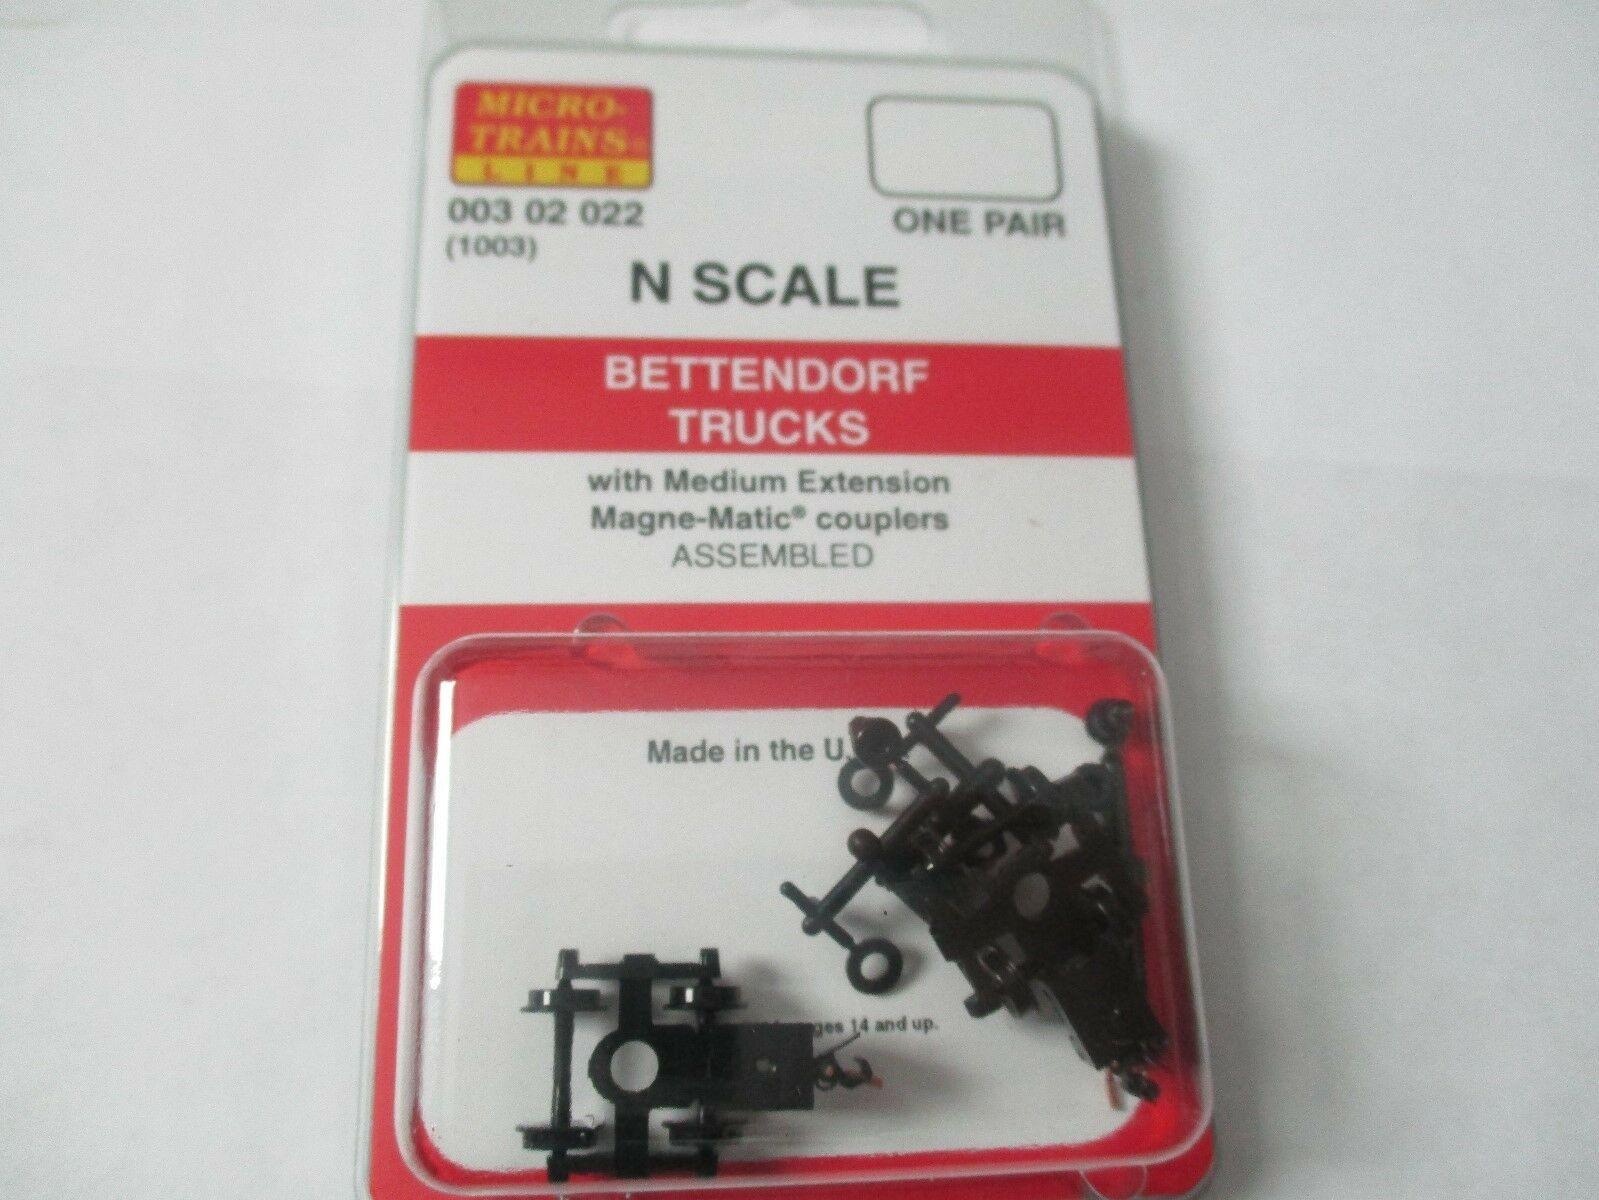 Micro-Trains Stock # 00302022 (1003)  Bettendorf Trucks Medium Extension N-Scale